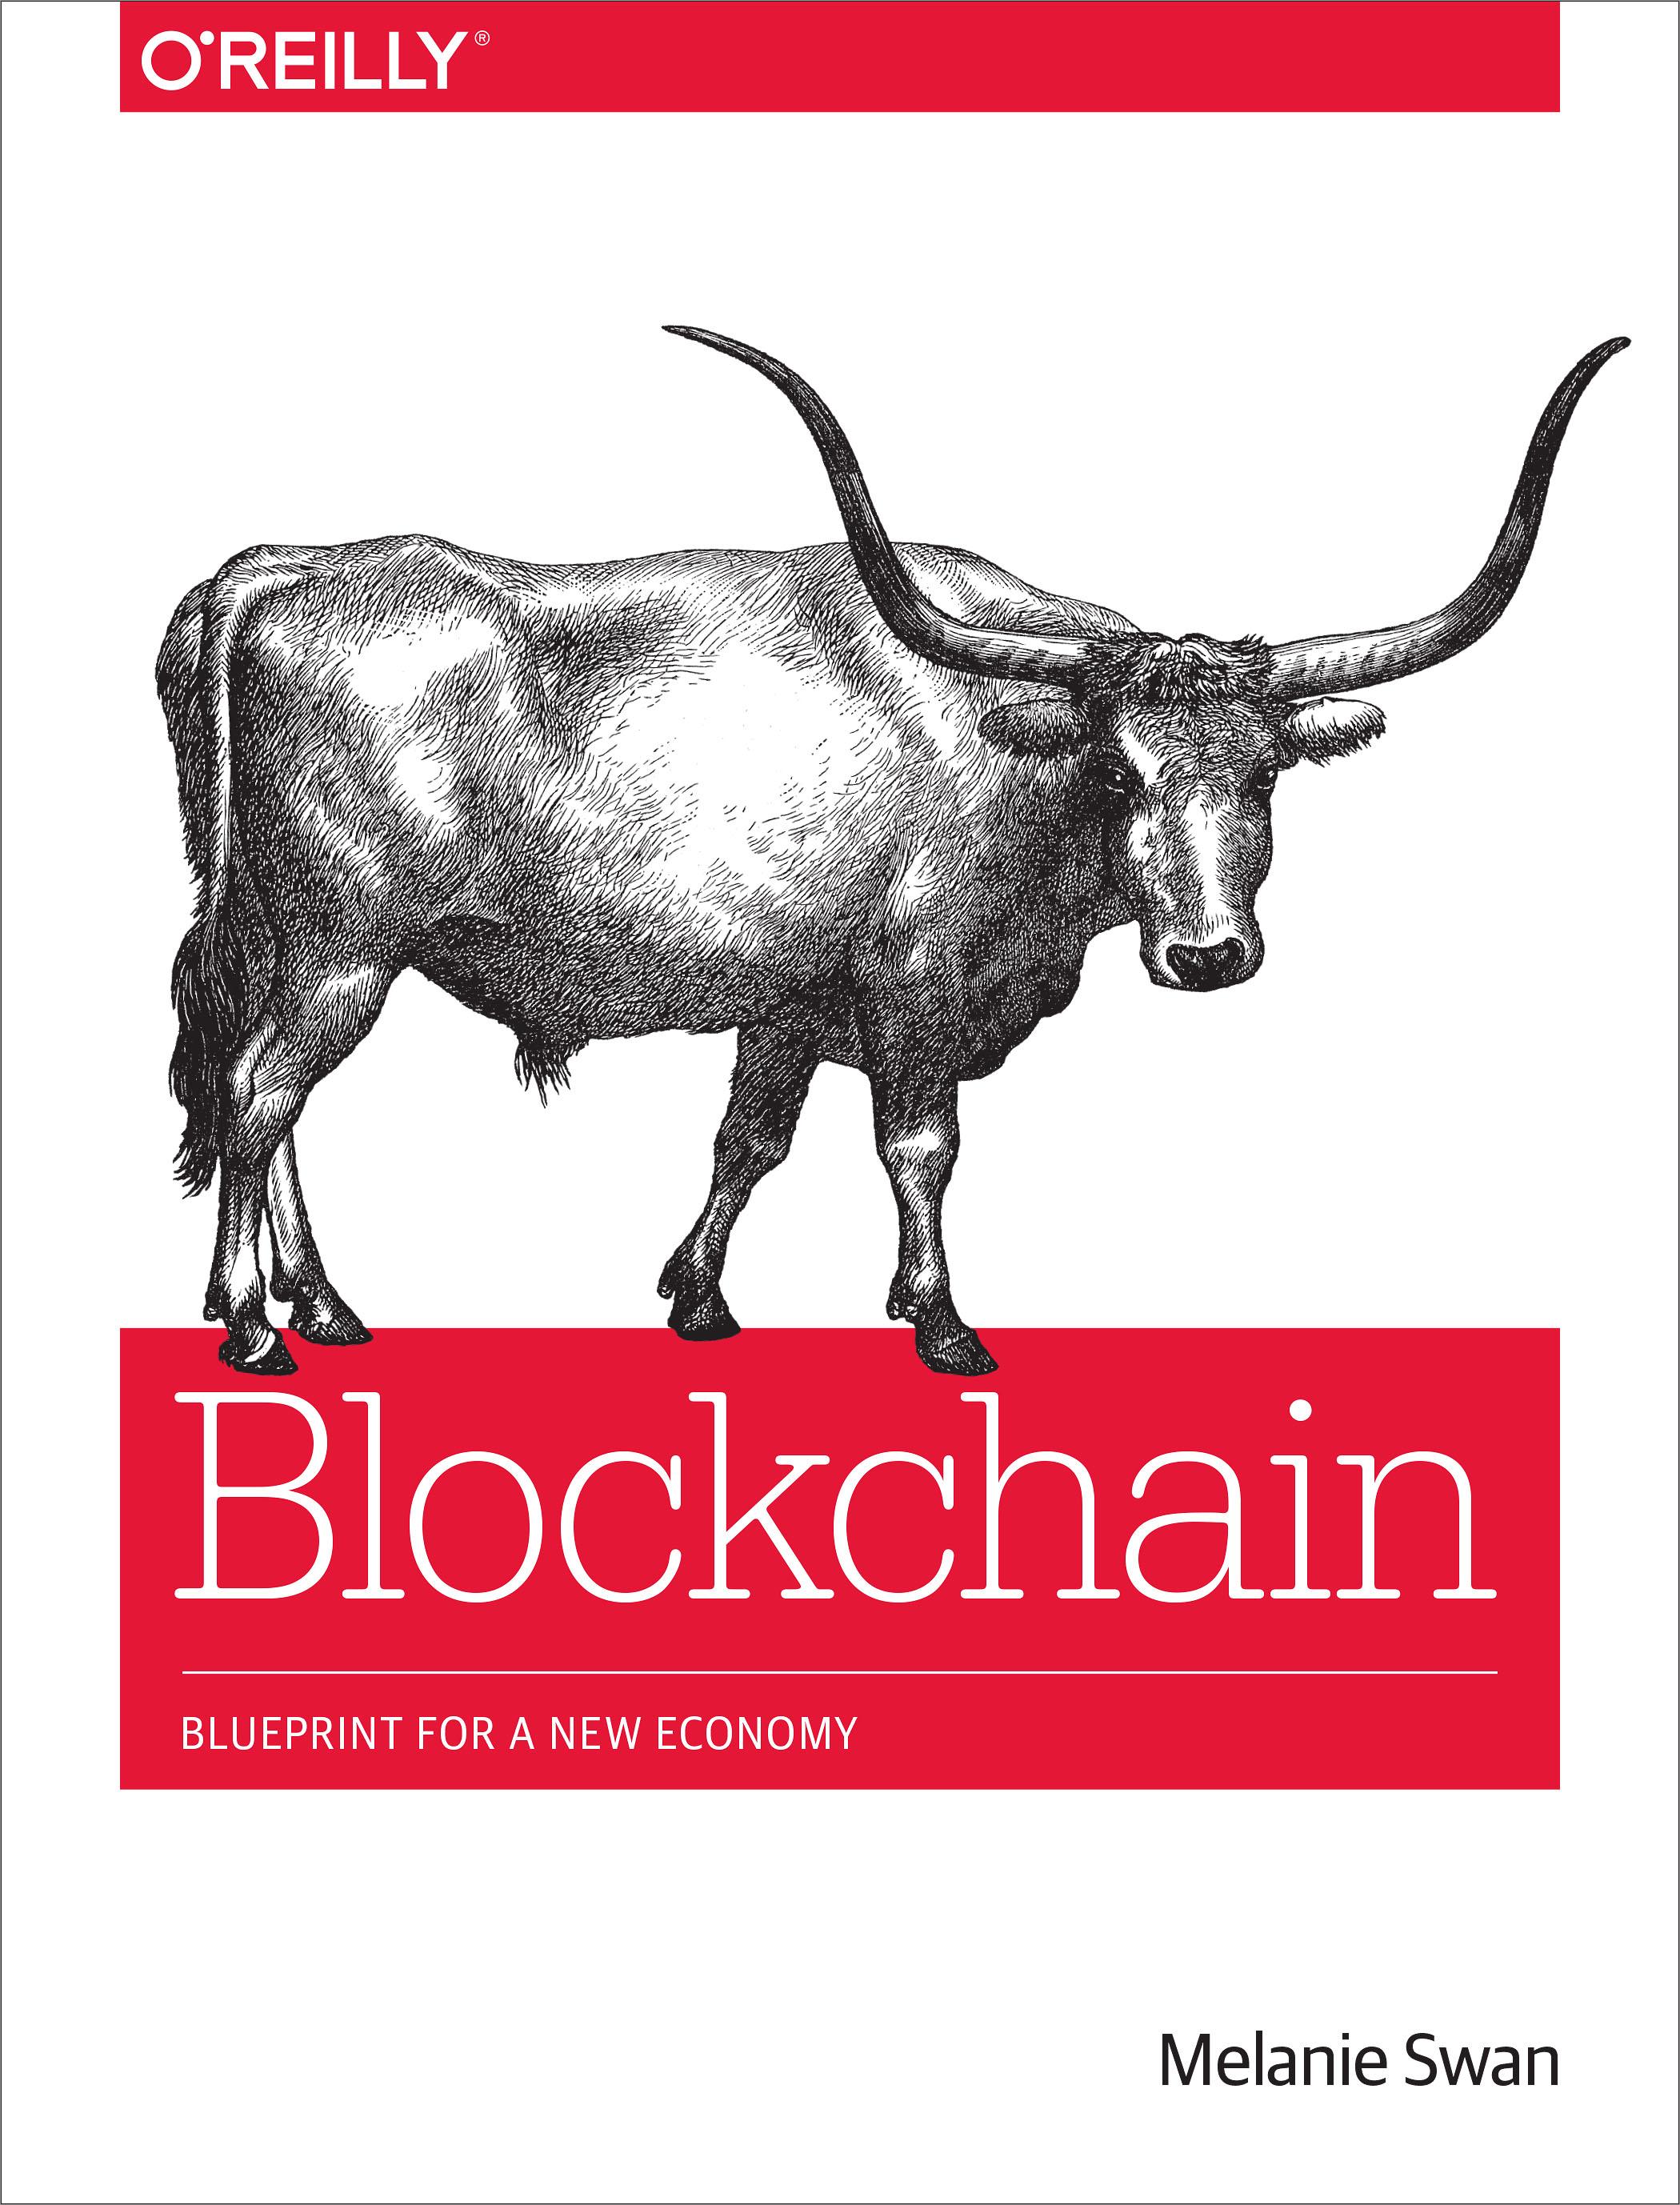 Download Ebook Blockchain by Melanie Swan Pdf